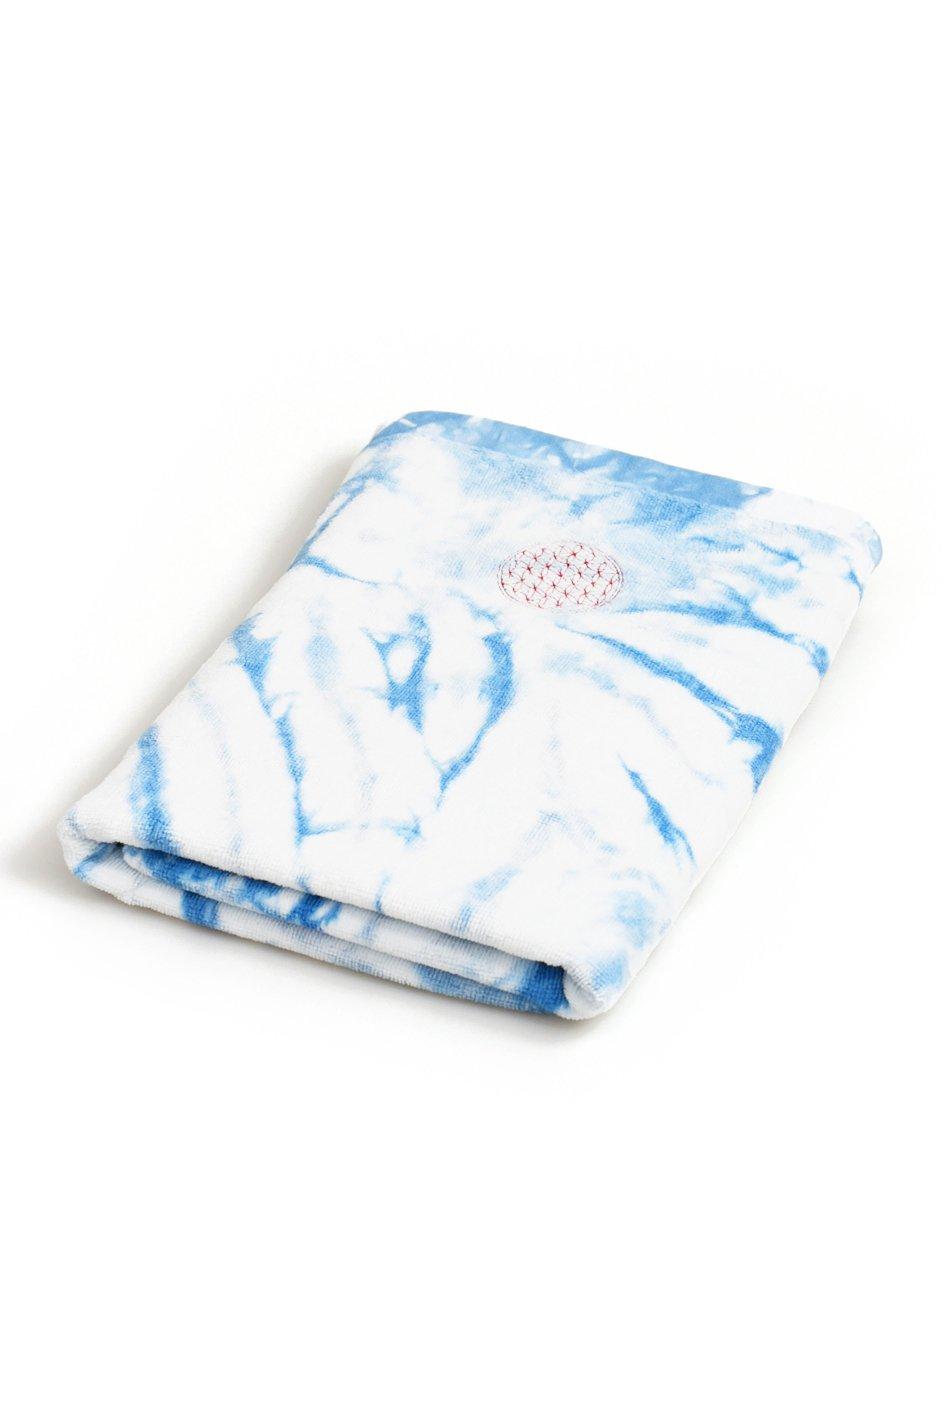 ARIGATO FAKKYU - アリガトファッキュ 藍染めタオル / 渦巻きムラ